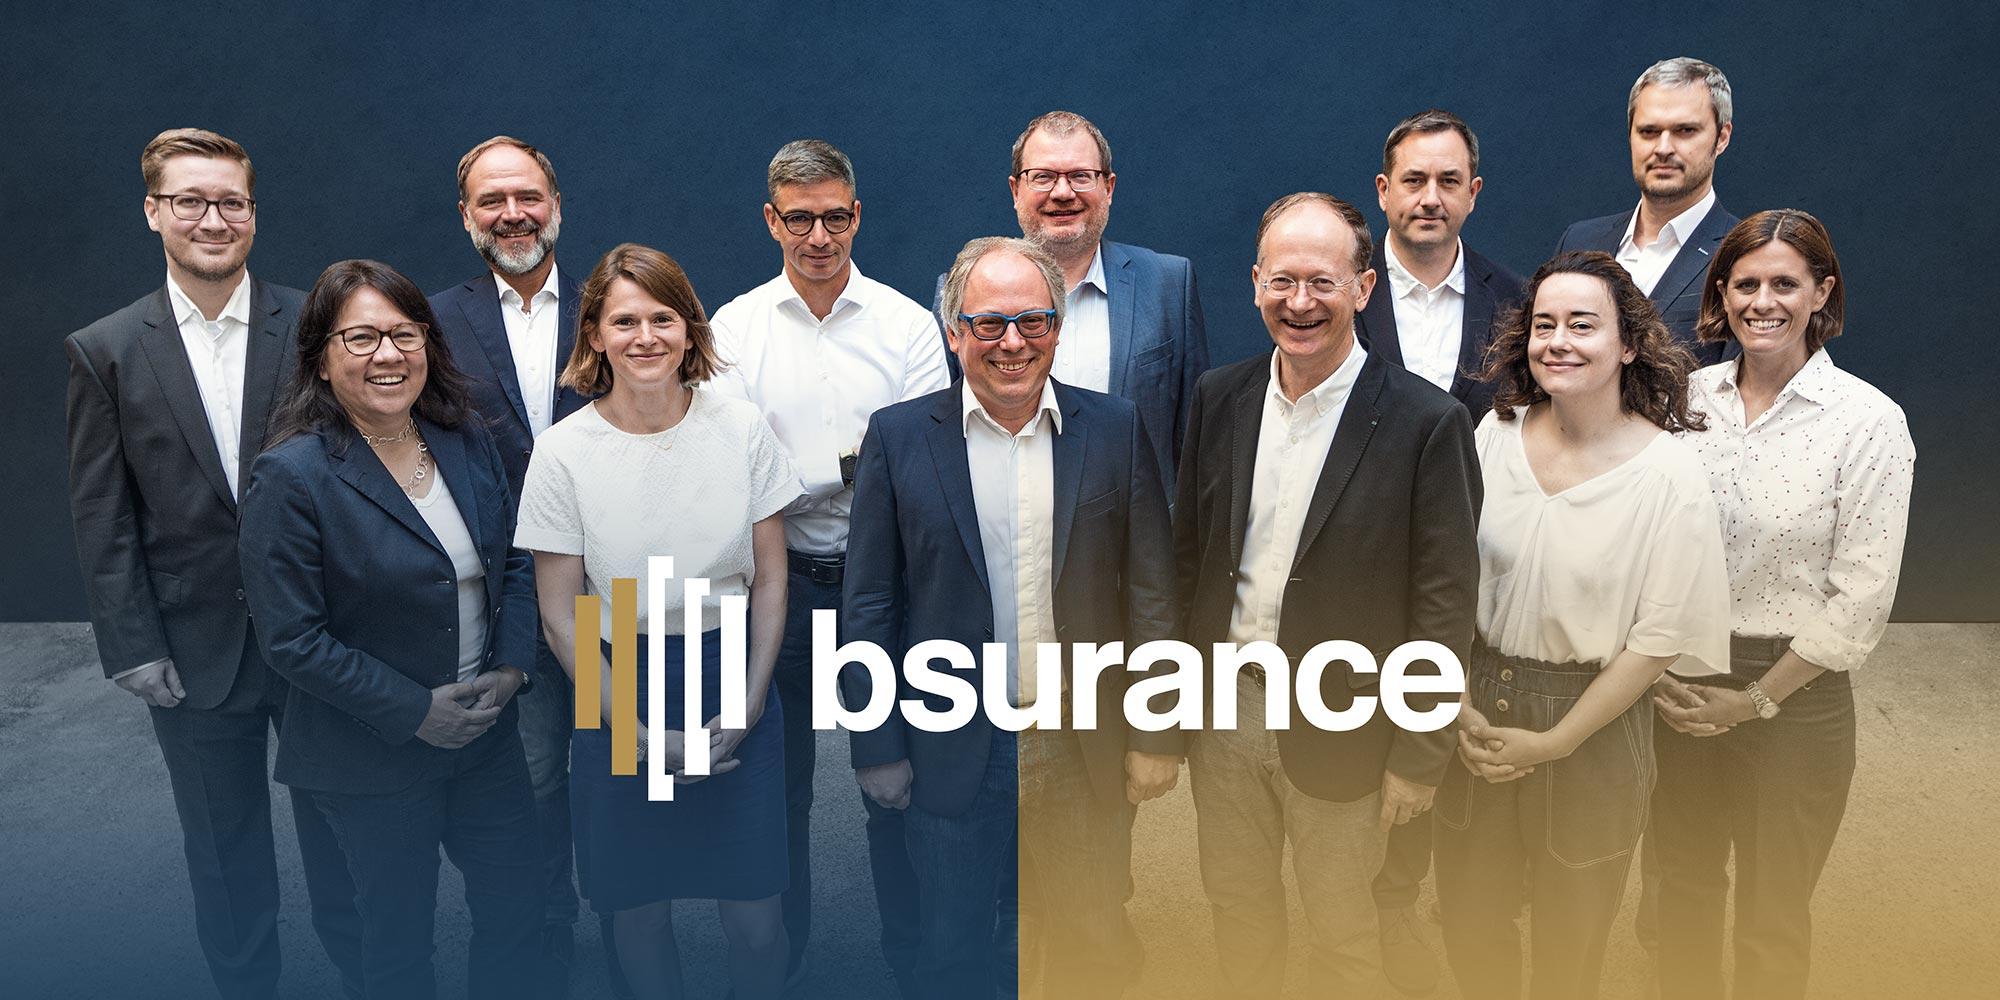 Team bsurance 2019